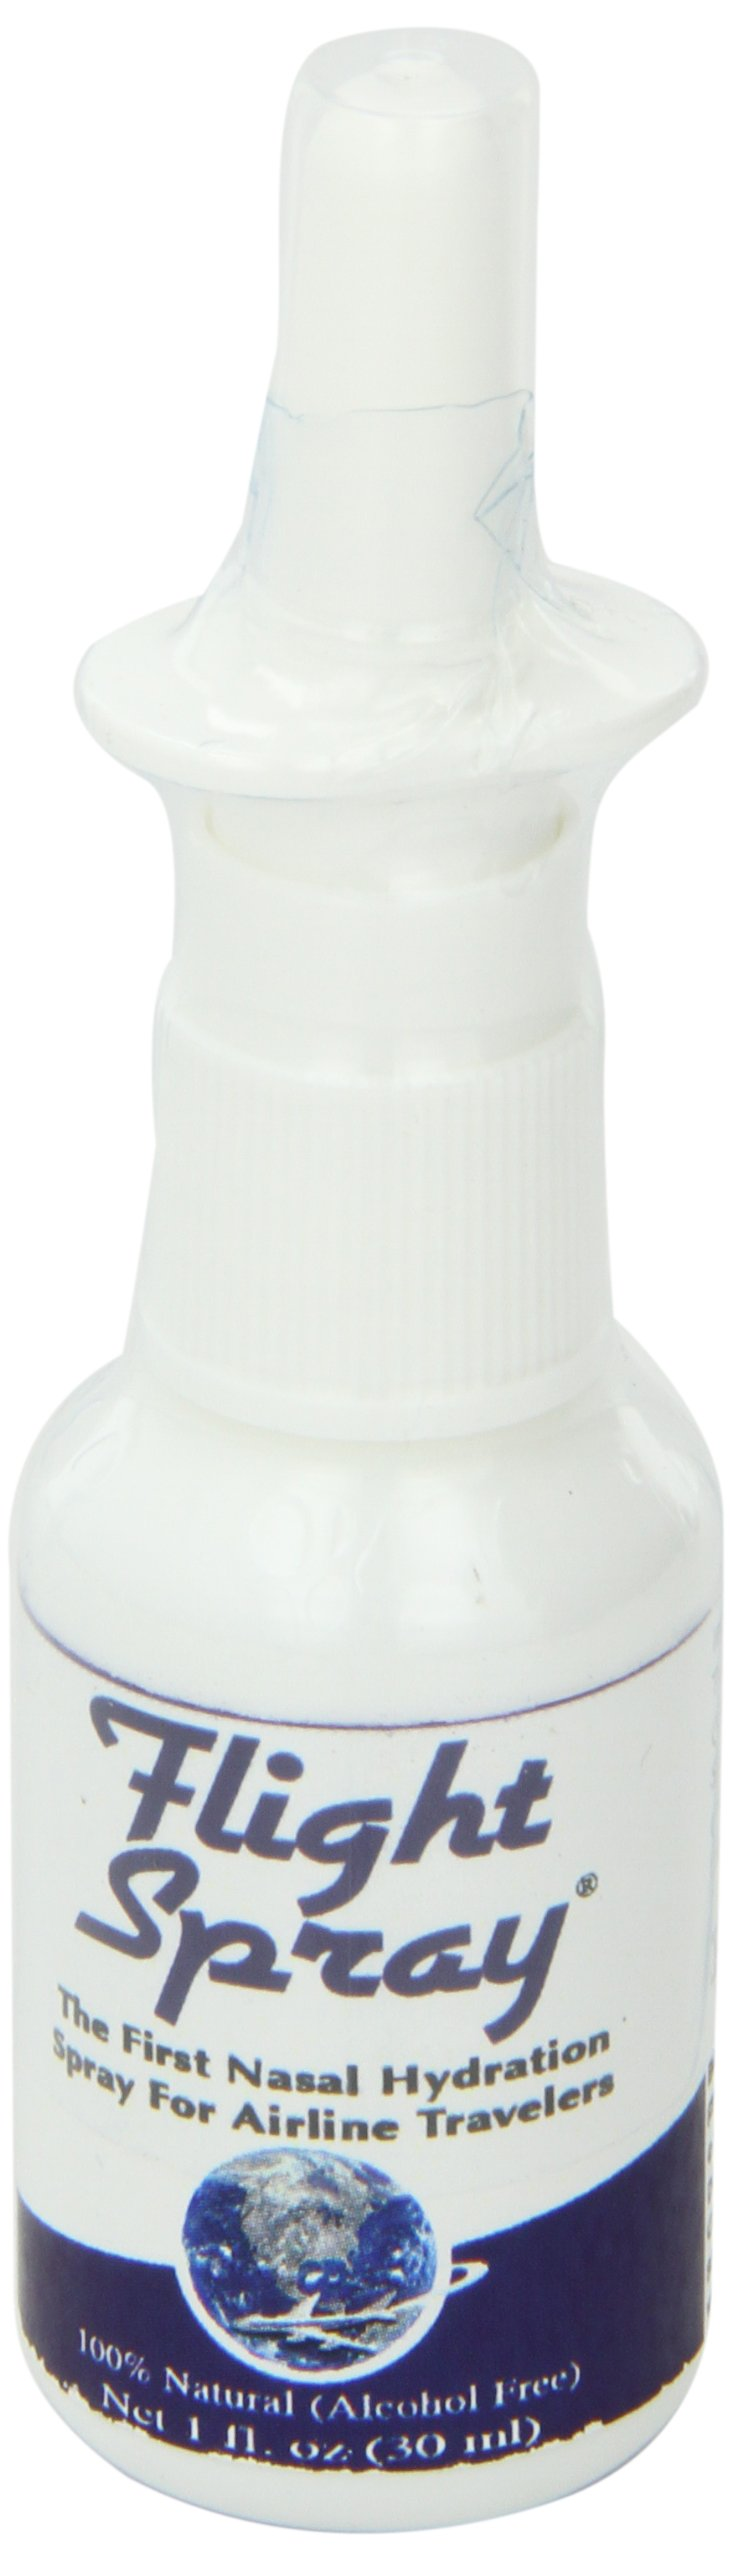 Flight Spray, Nasal Hydration Spray, 1 Ounce Bottle by Bioponic Phytoceuticals